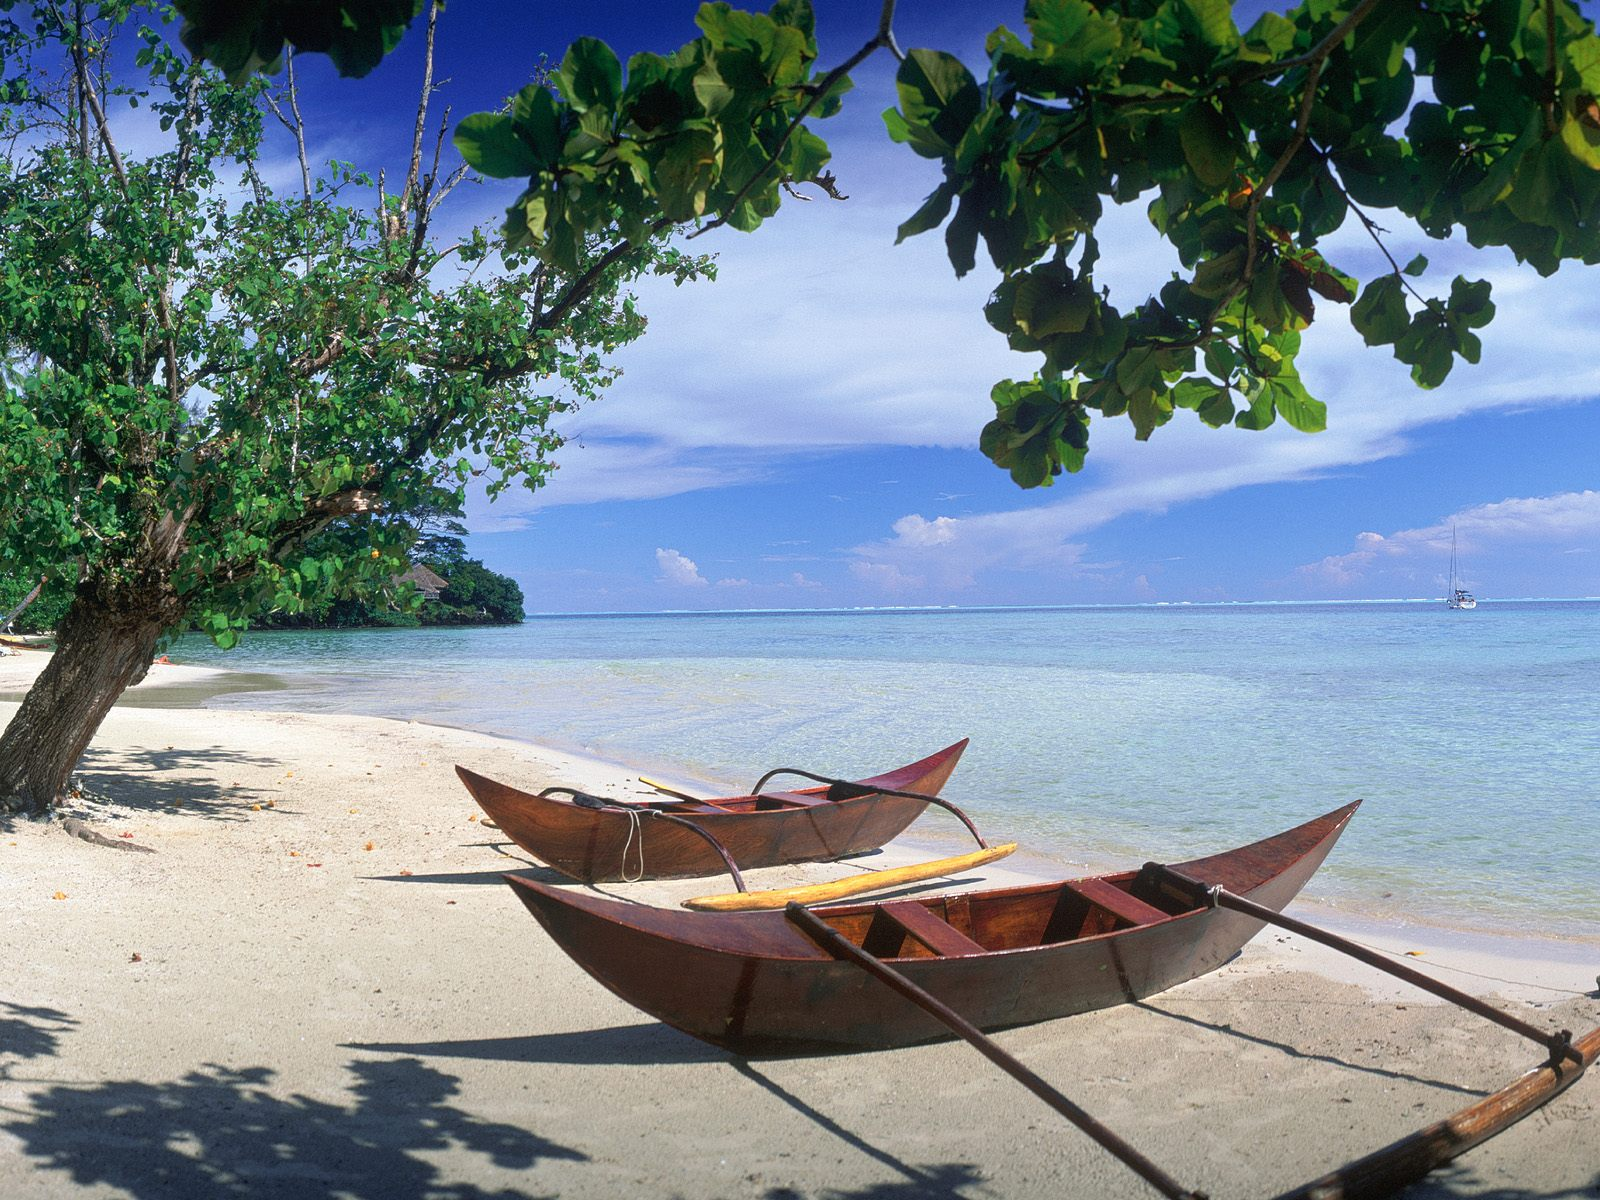 Hana Iti Beach - Hana Iti Beach